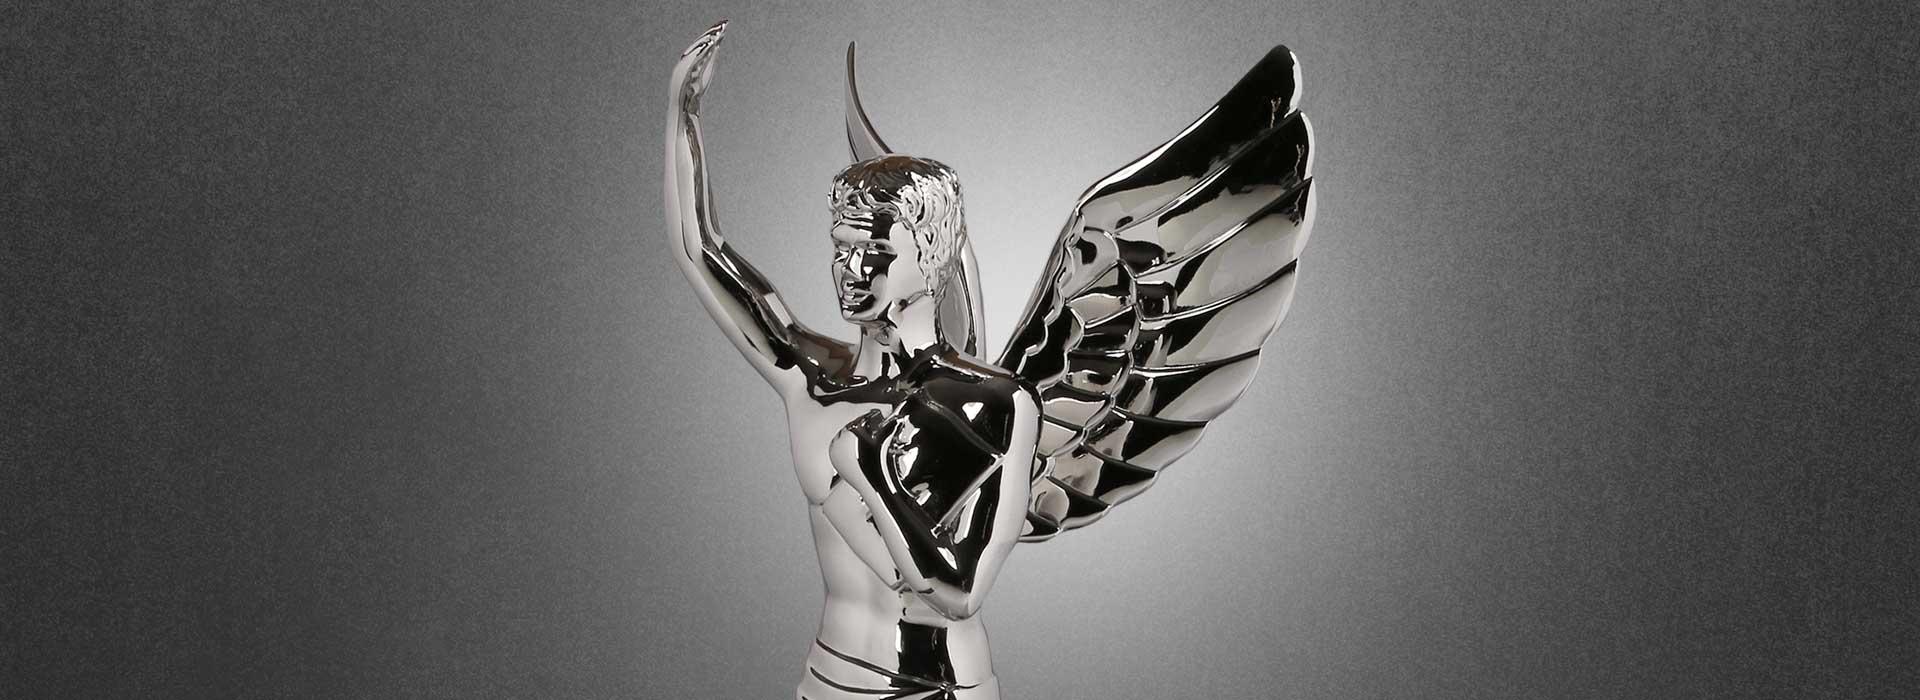 Starmark wins three 2013 Hermes Creative Awards